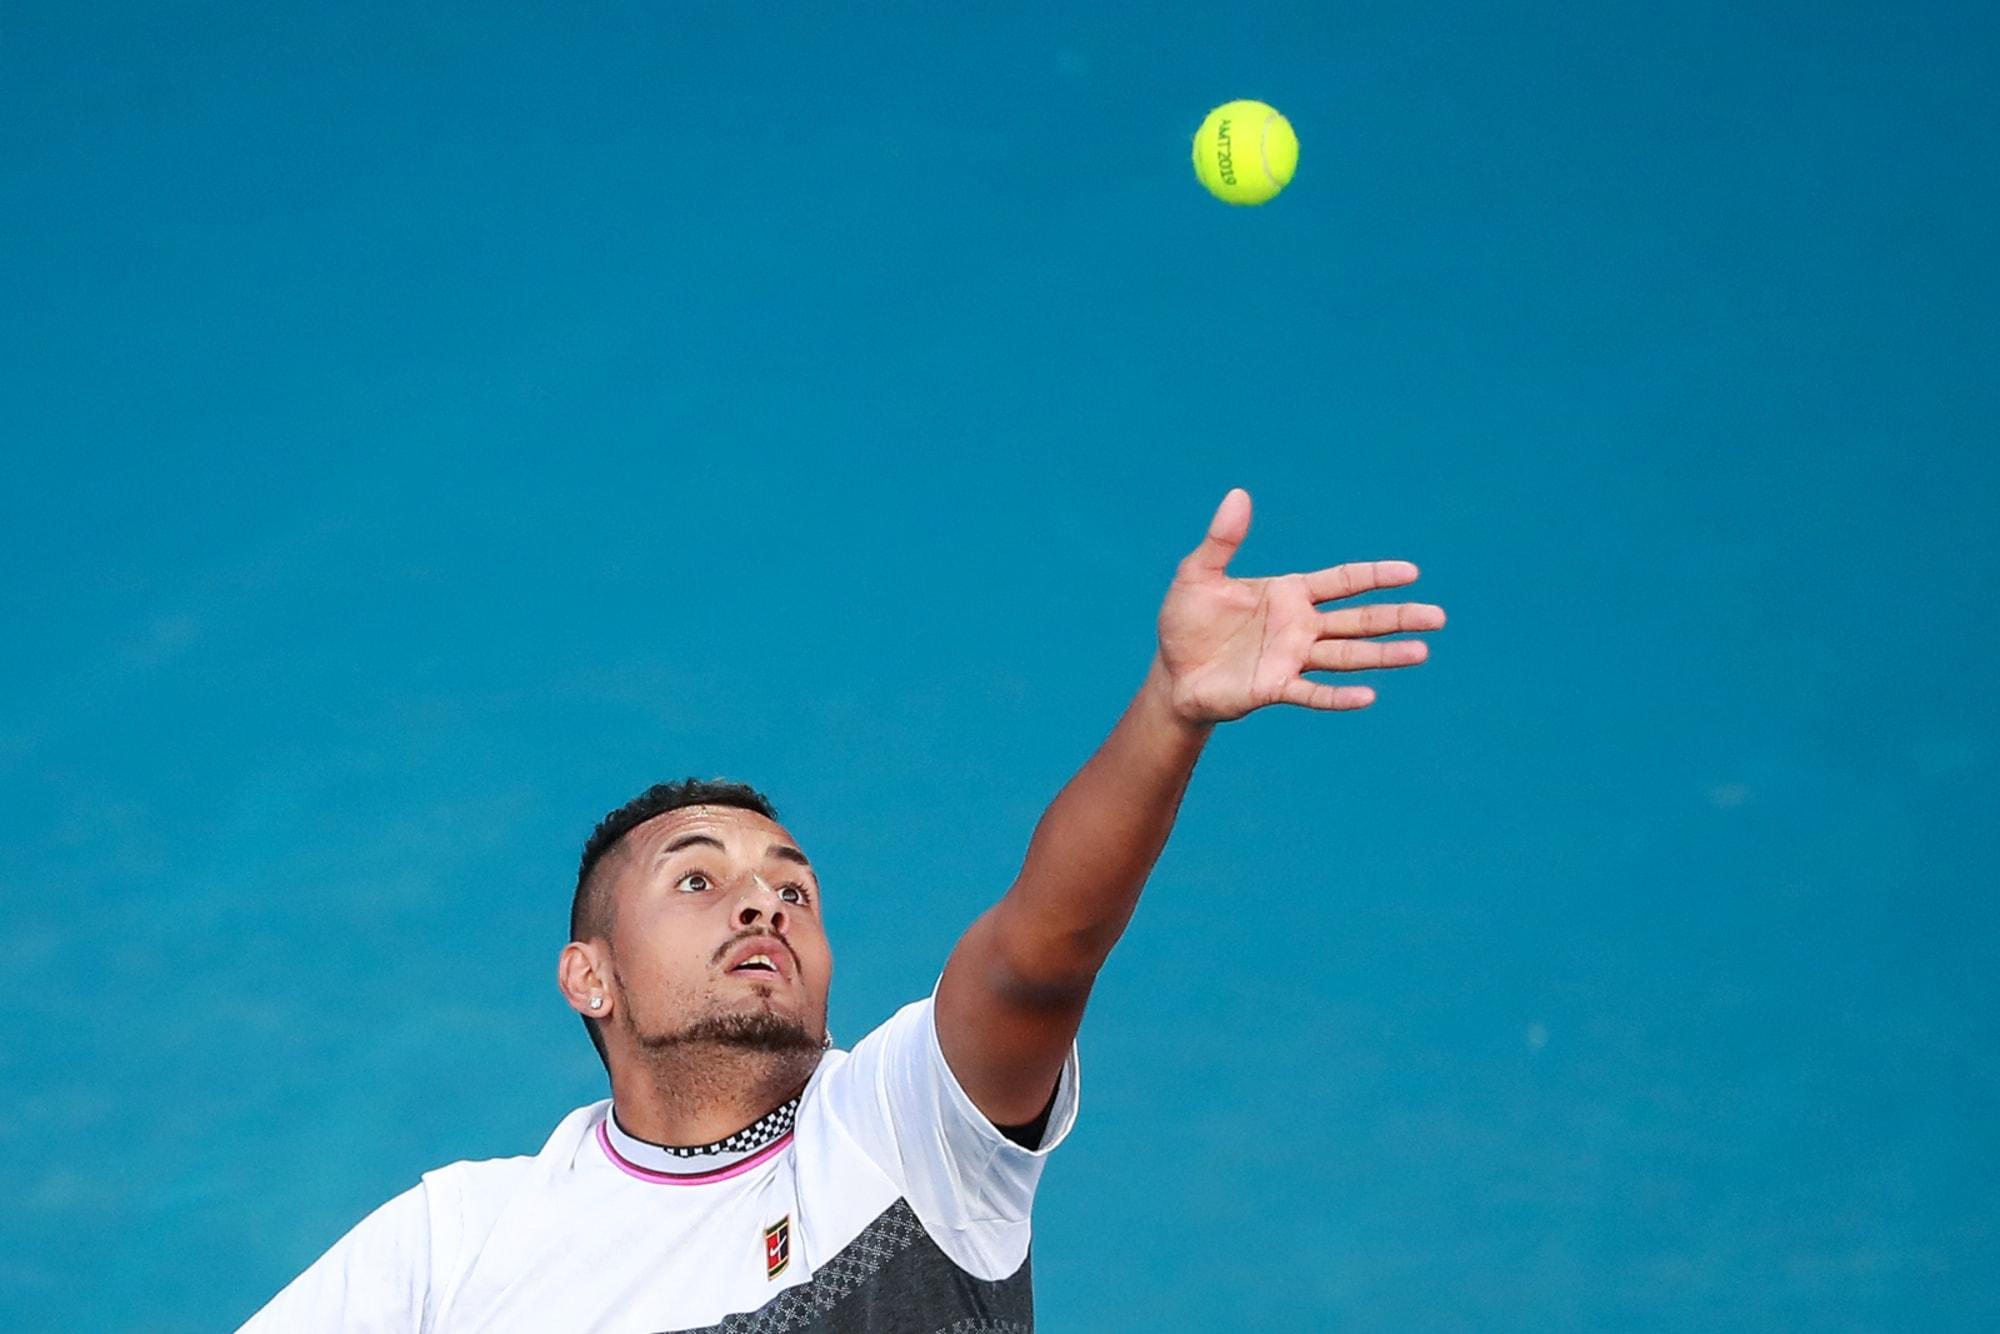 Acapulco Predictions Rafael Nadal Versus Nick Kyrgios